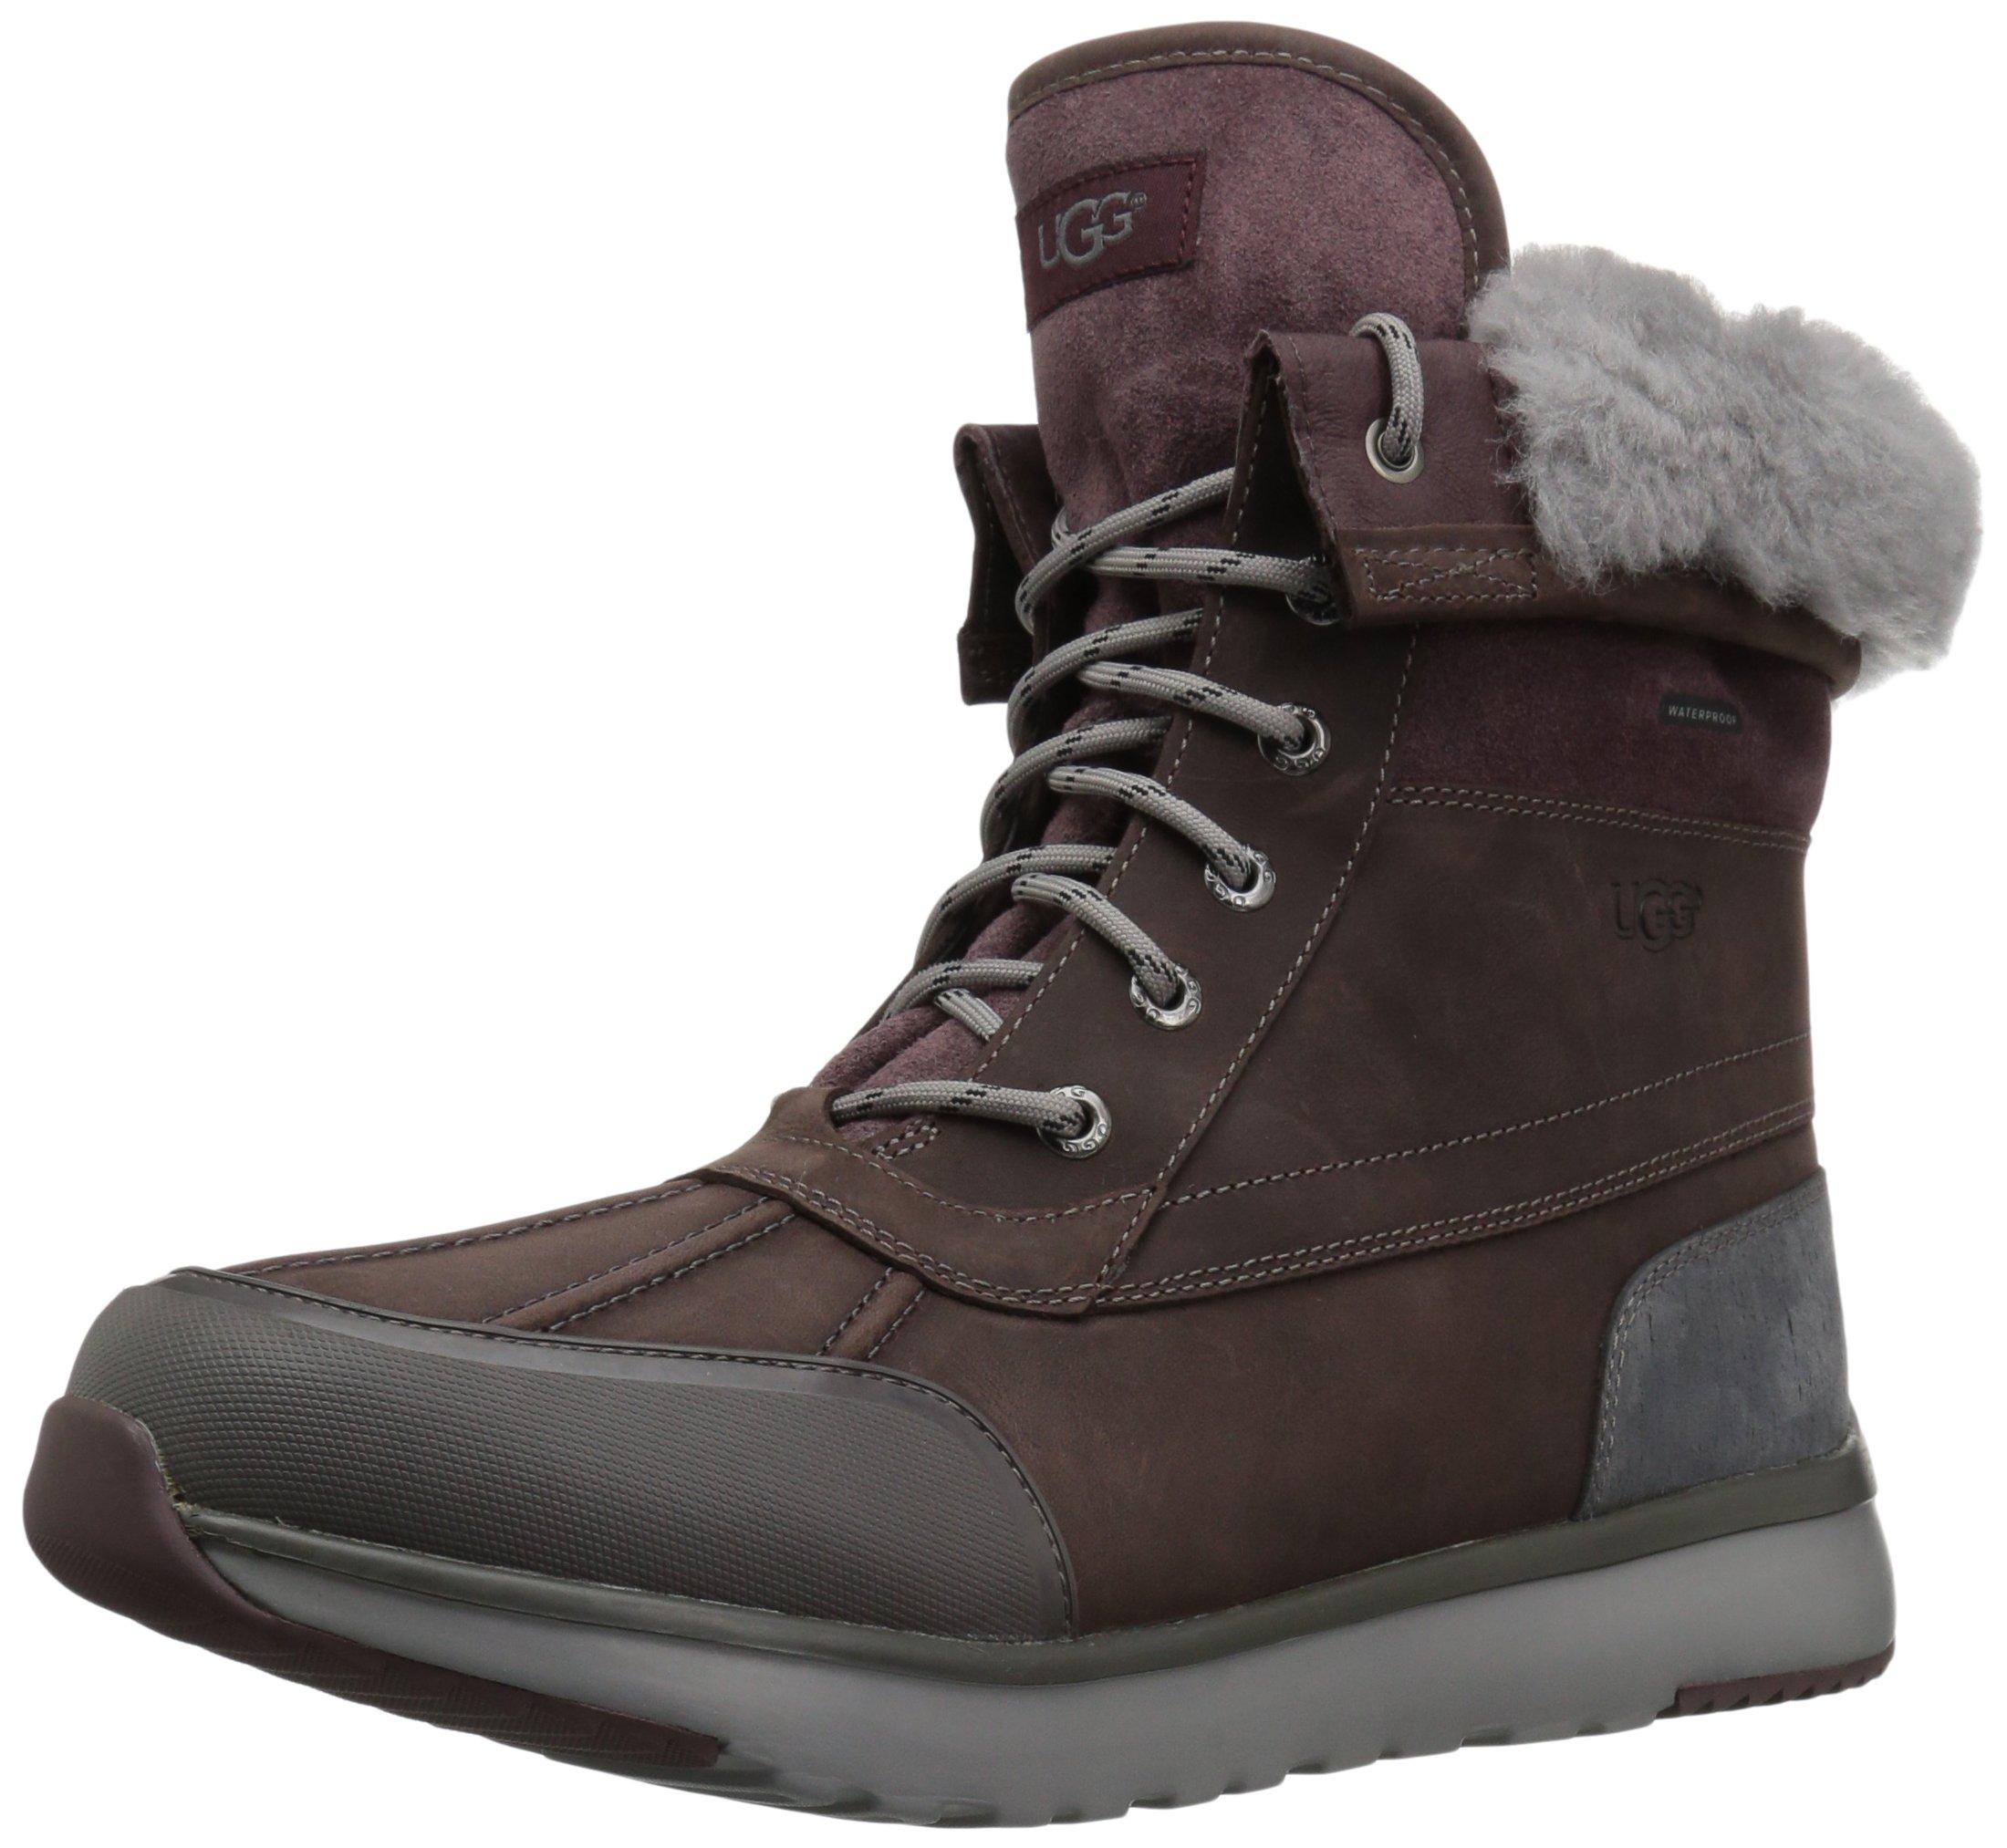 UGG Men's Eliasson Snow Boot, Cordovan, 18 M US